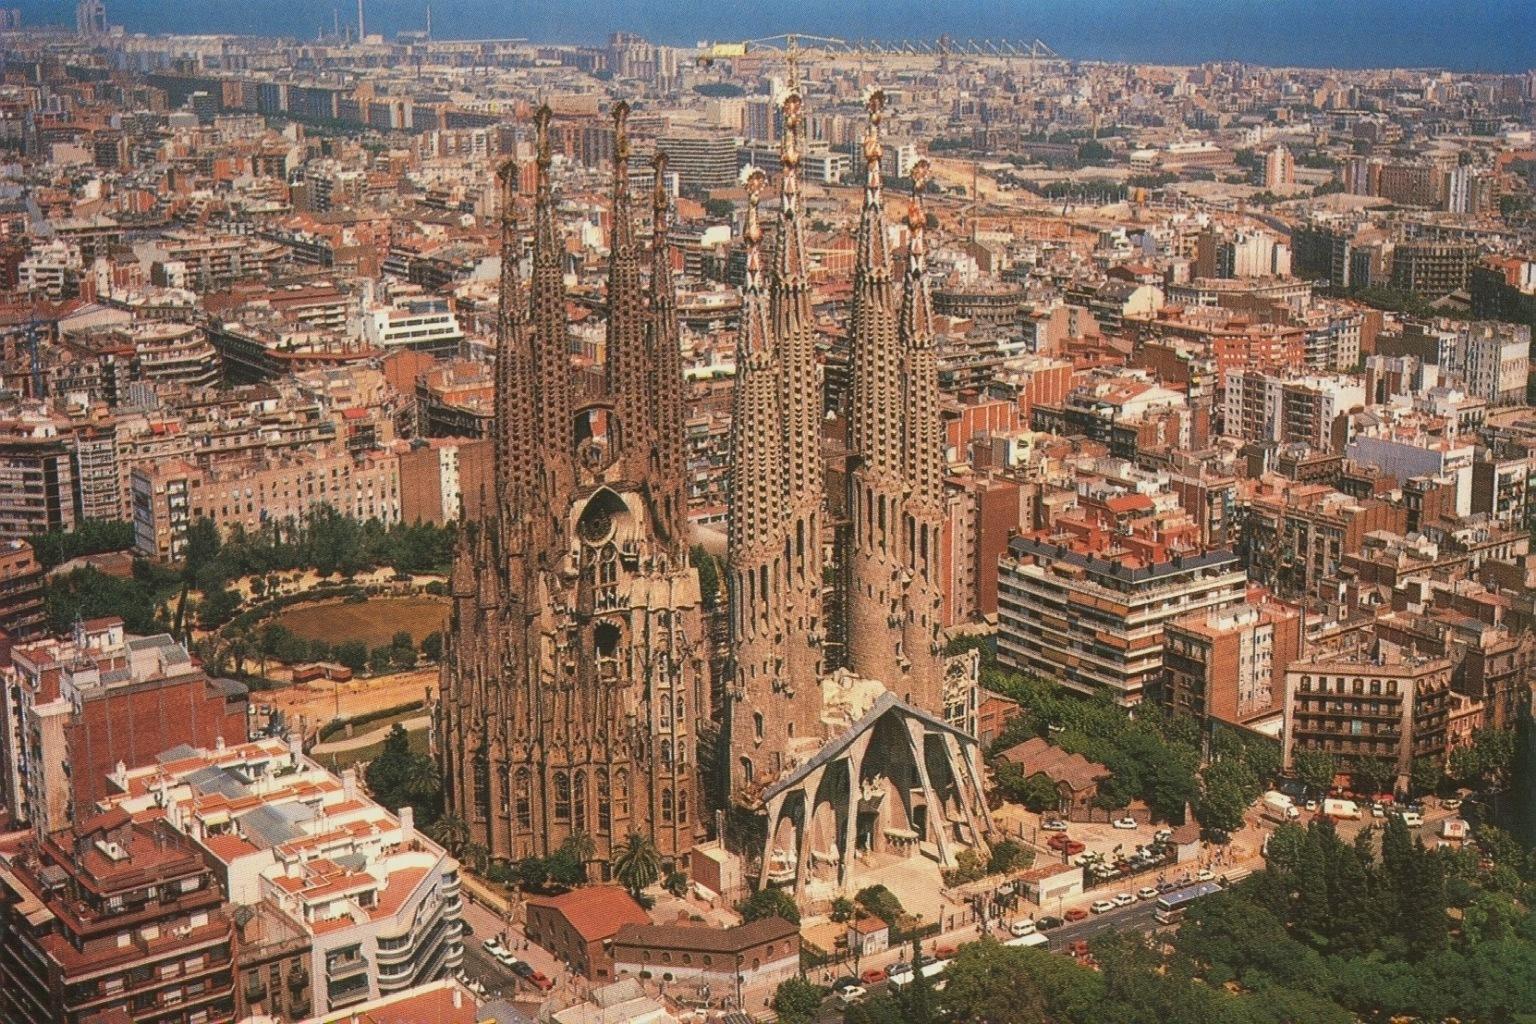 Peque o garaje de 30 plazas junto sagrada familia en barcelona - La botigueta barcelona ...